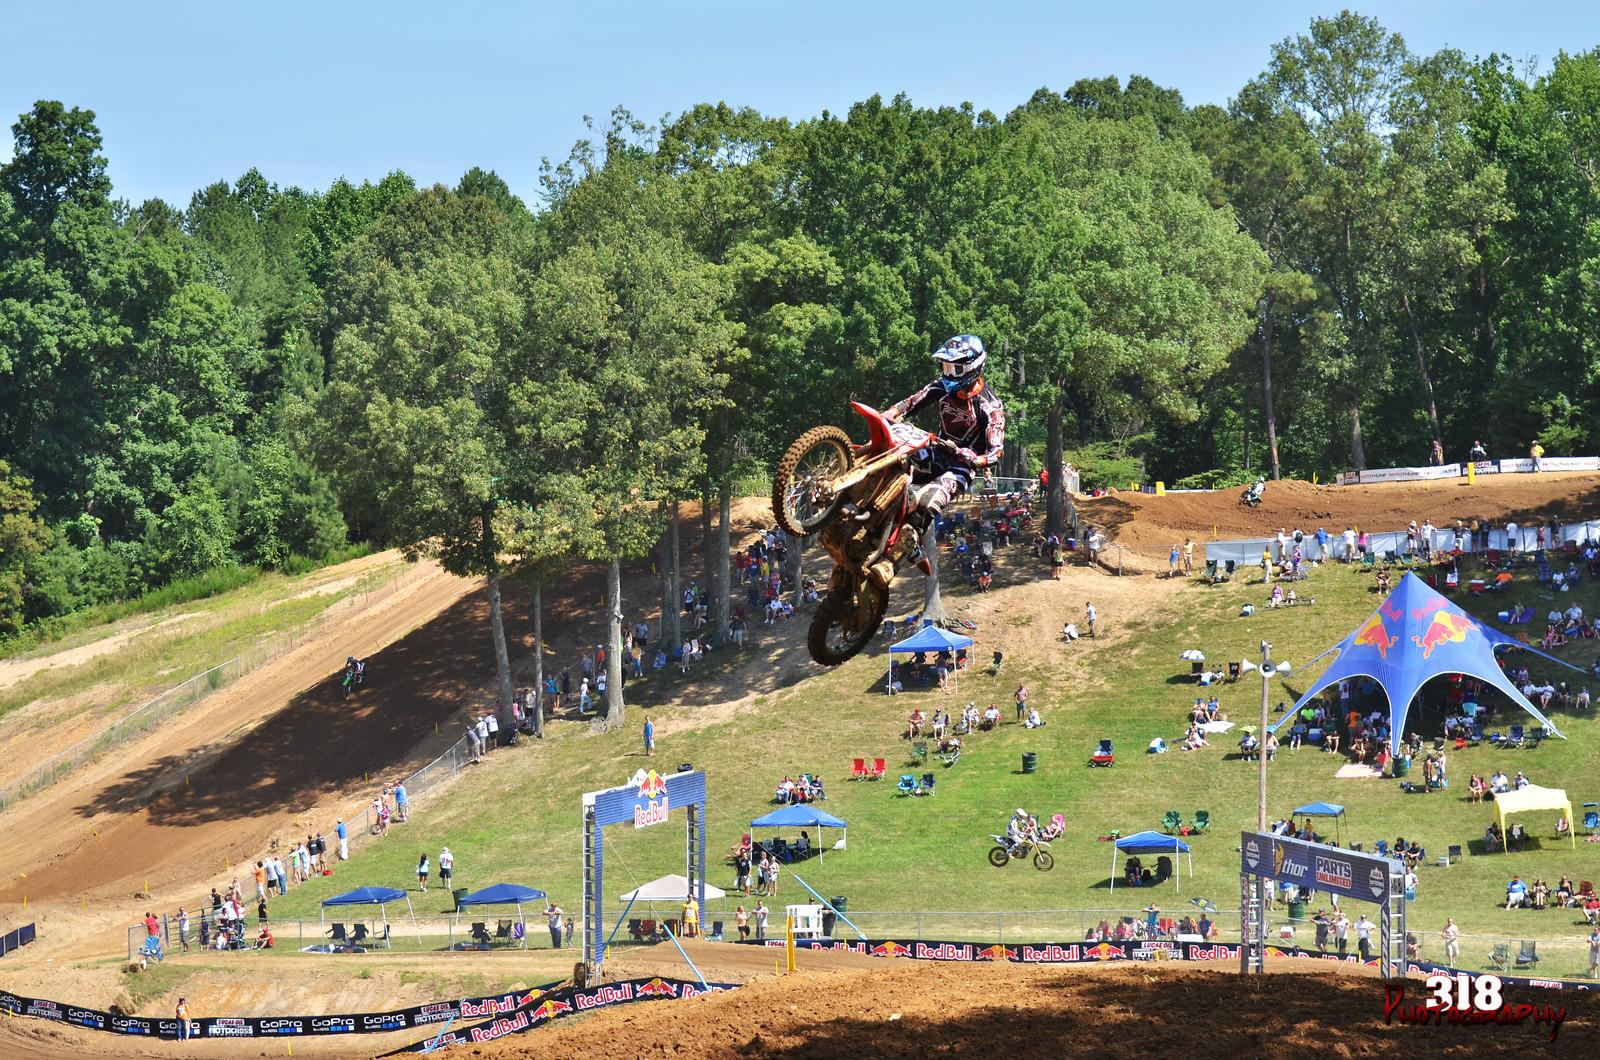 62-01 - MxPro318 - Motocross Pictures - Vital MX